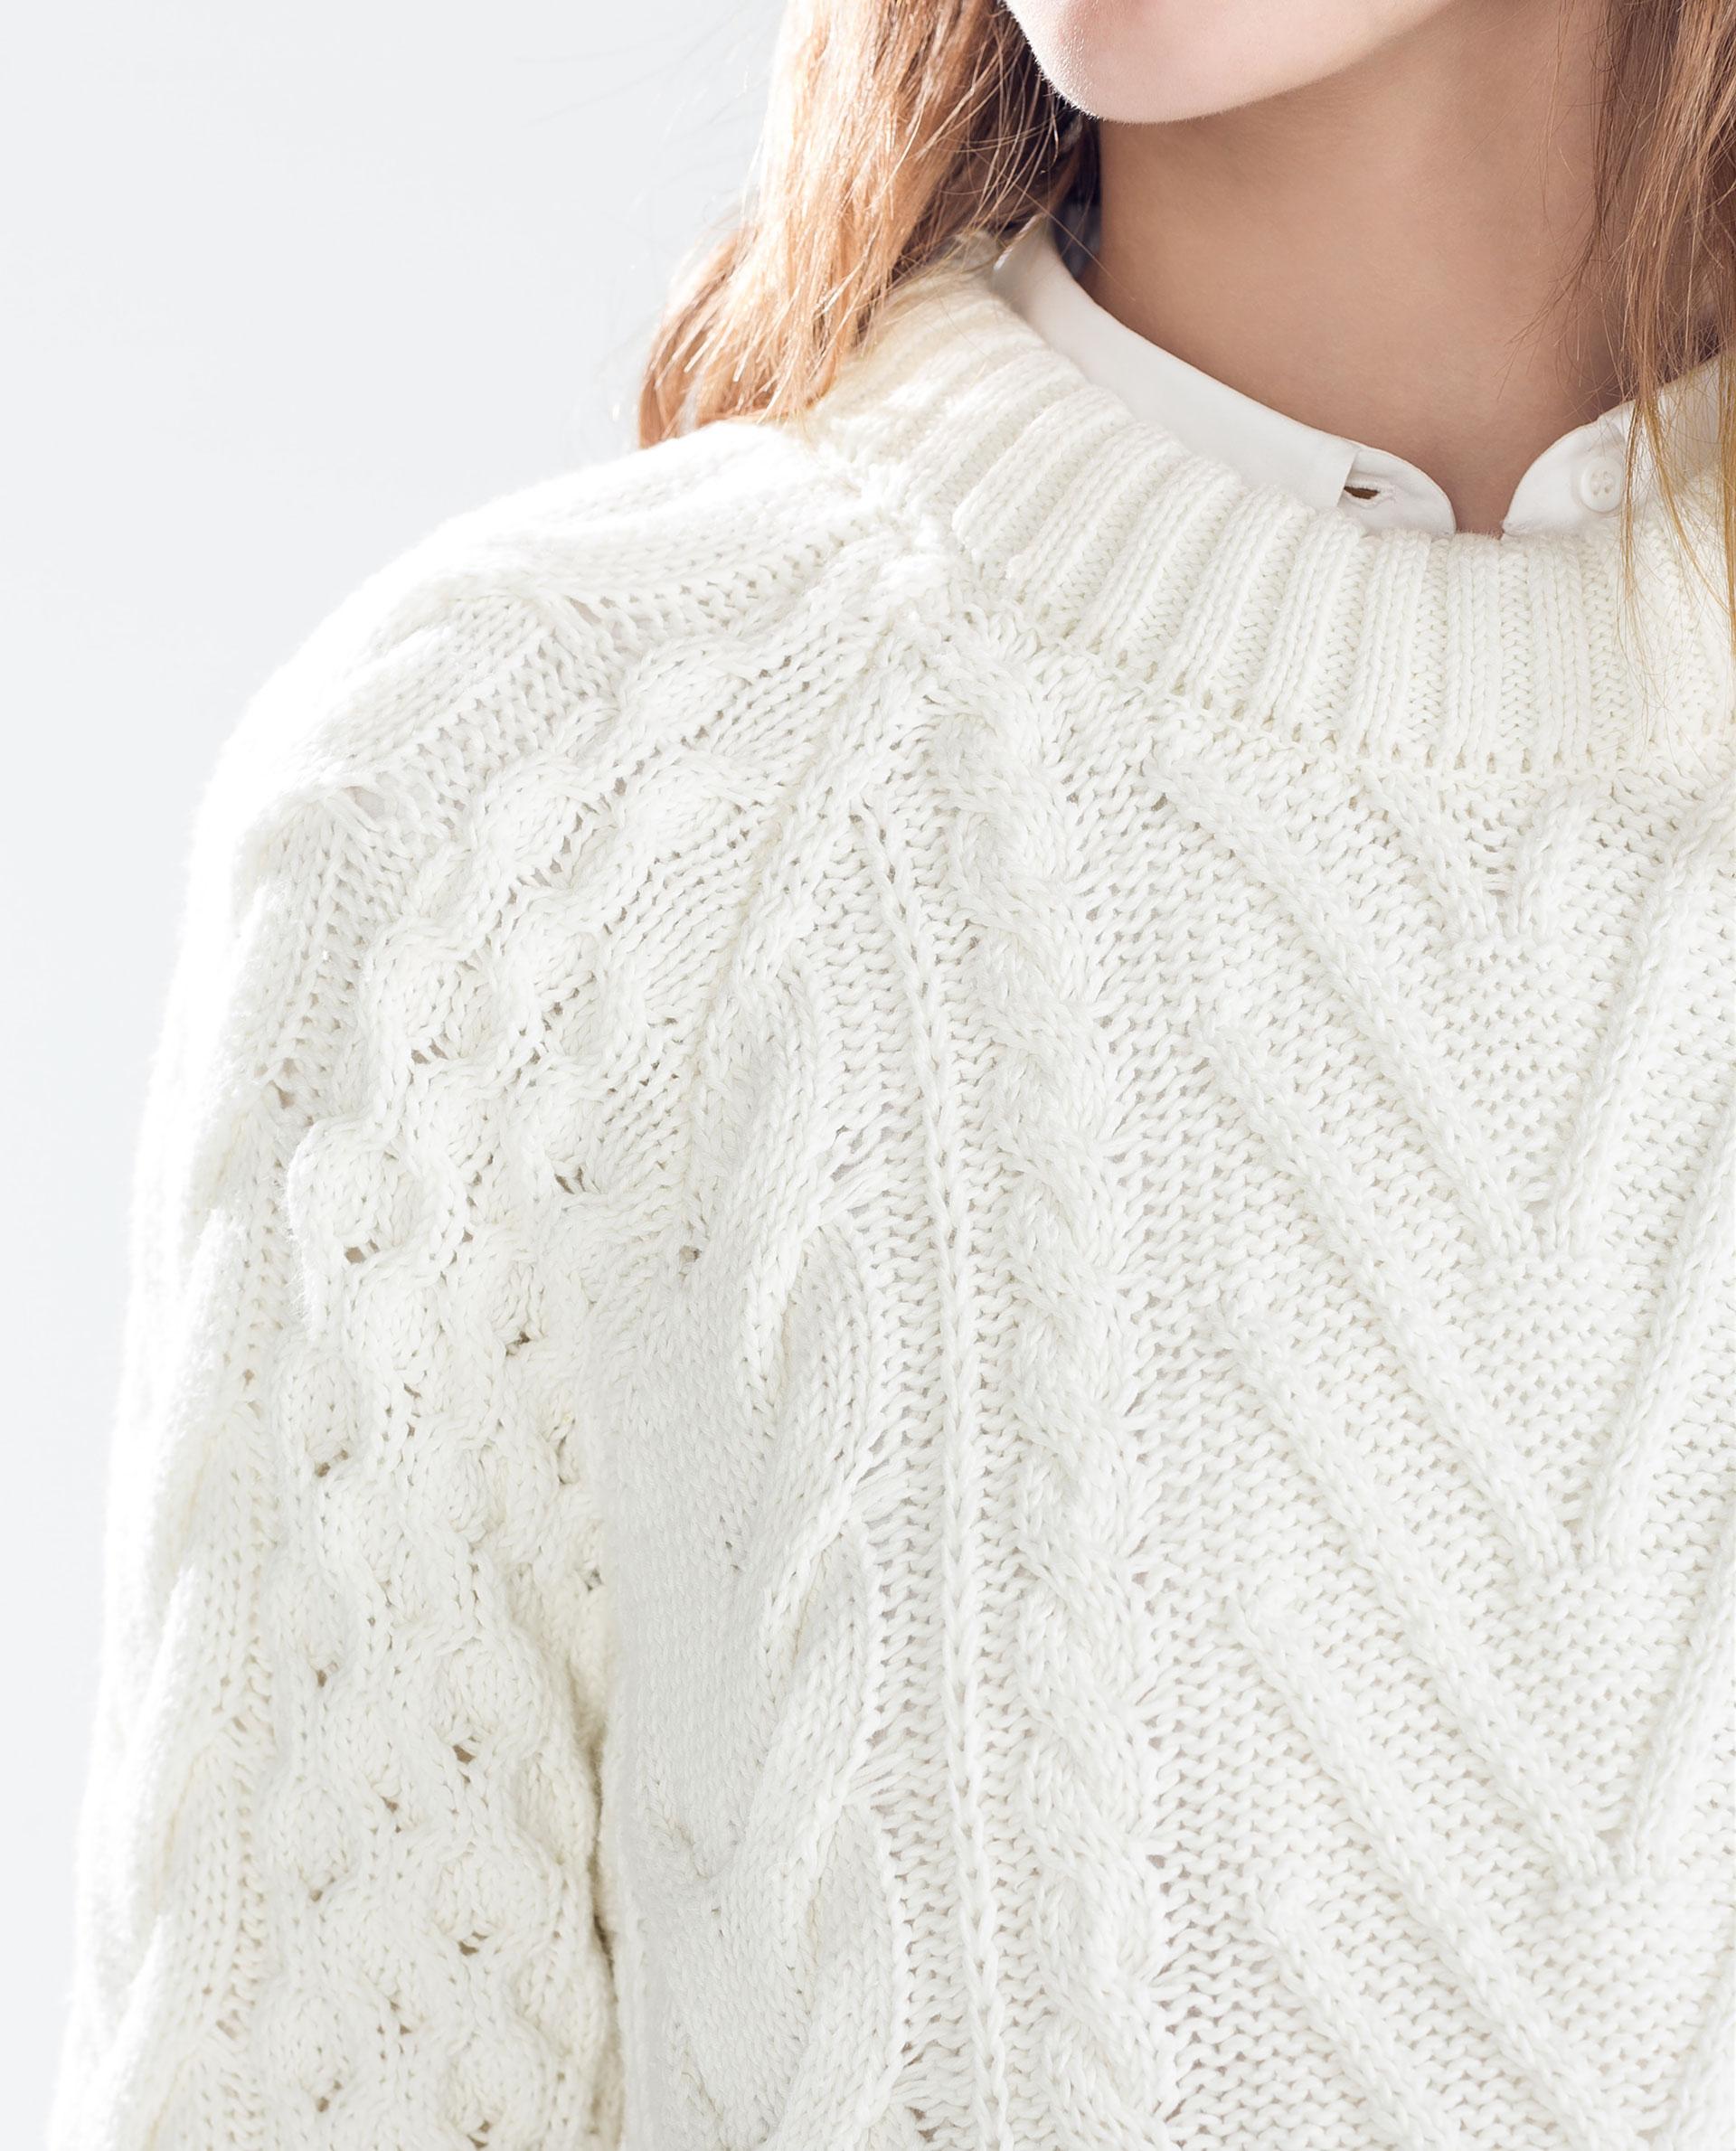 White Turtleneck Knit Sweater 88